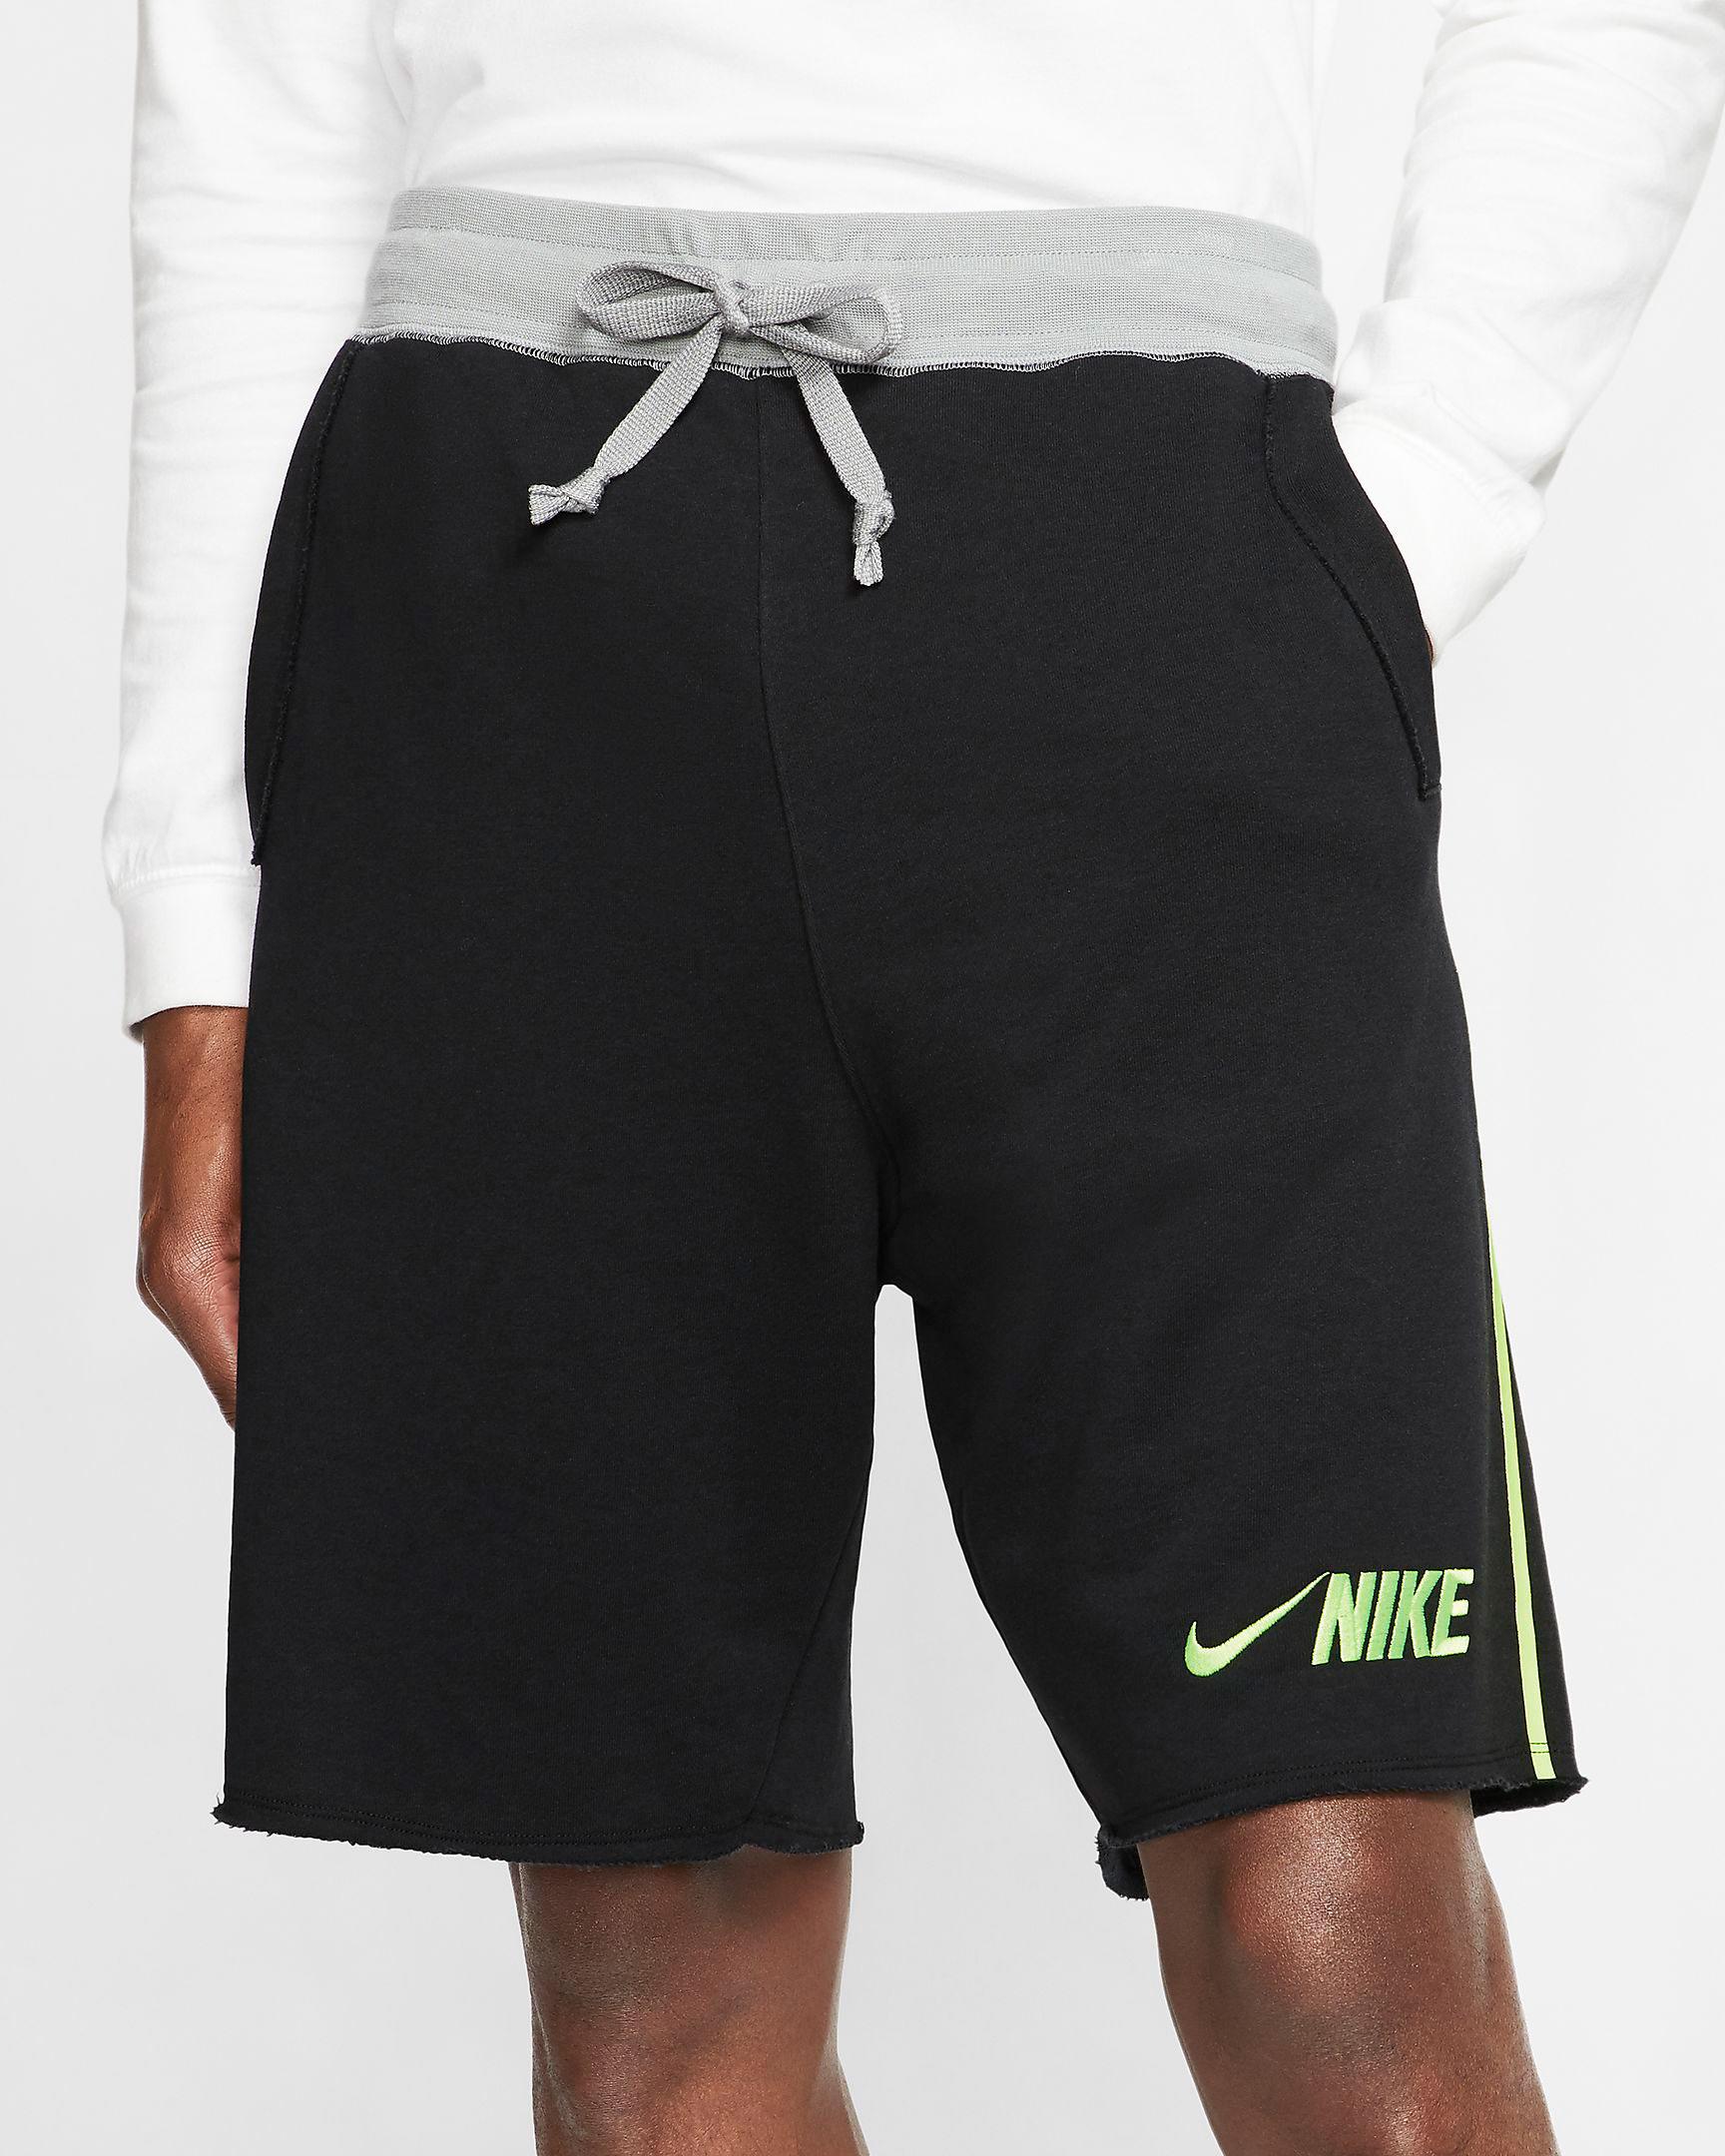 air-jordan-4-neon-nike-black-volt-shorts-1